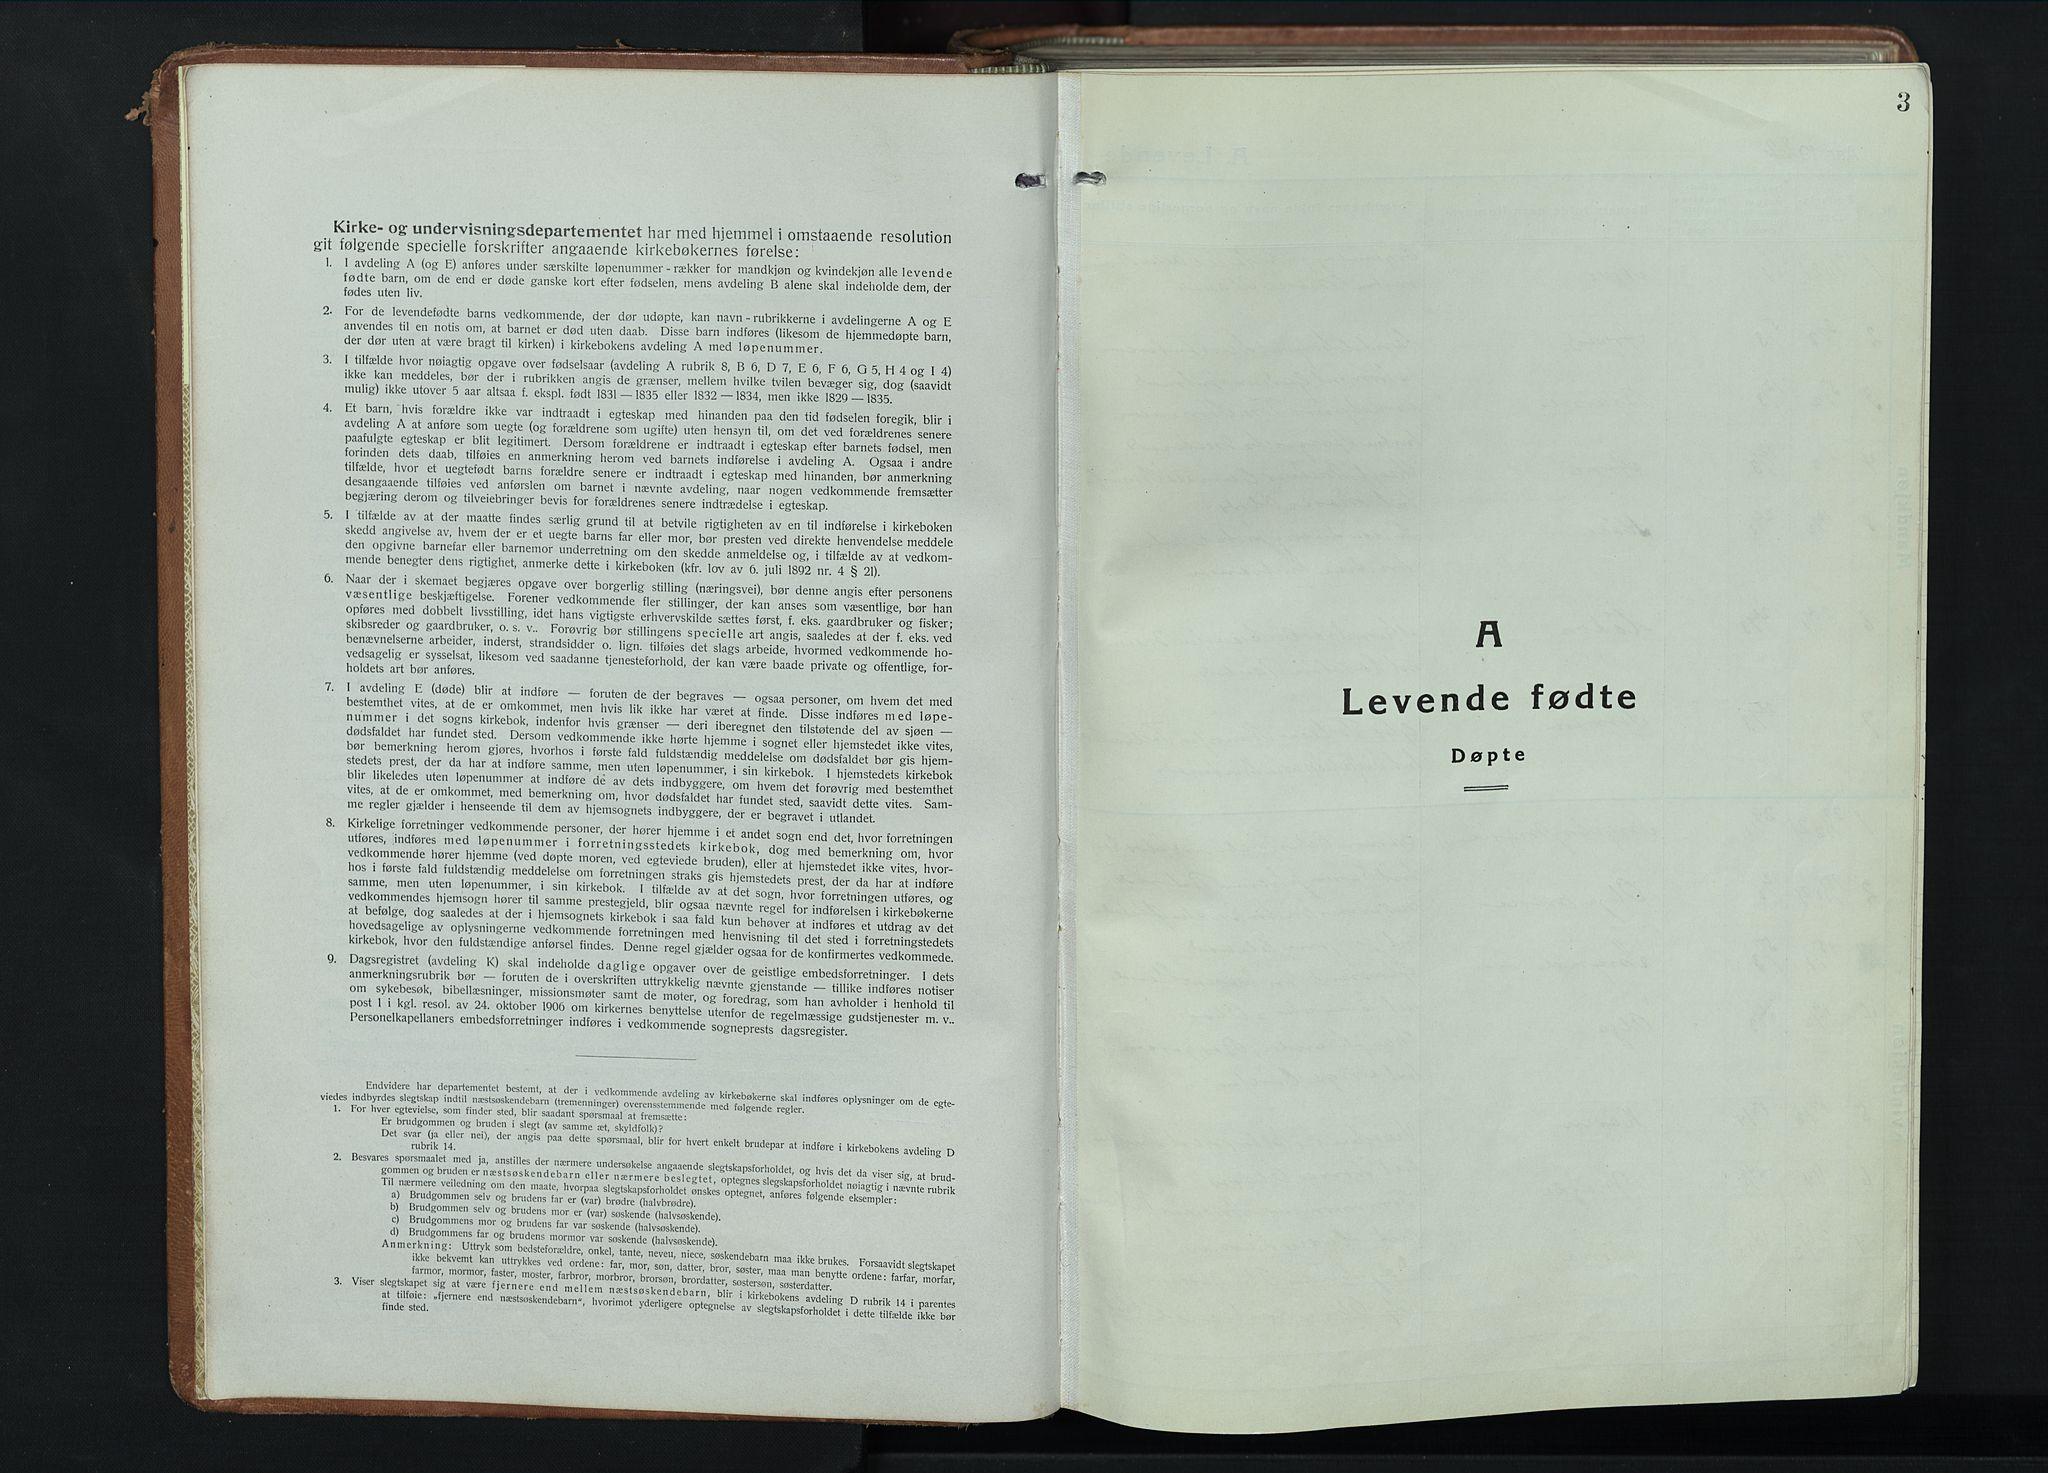 SAH, Fåberg prestekontor, Klokkerbok nr. 14, 1922-1946, s. 3